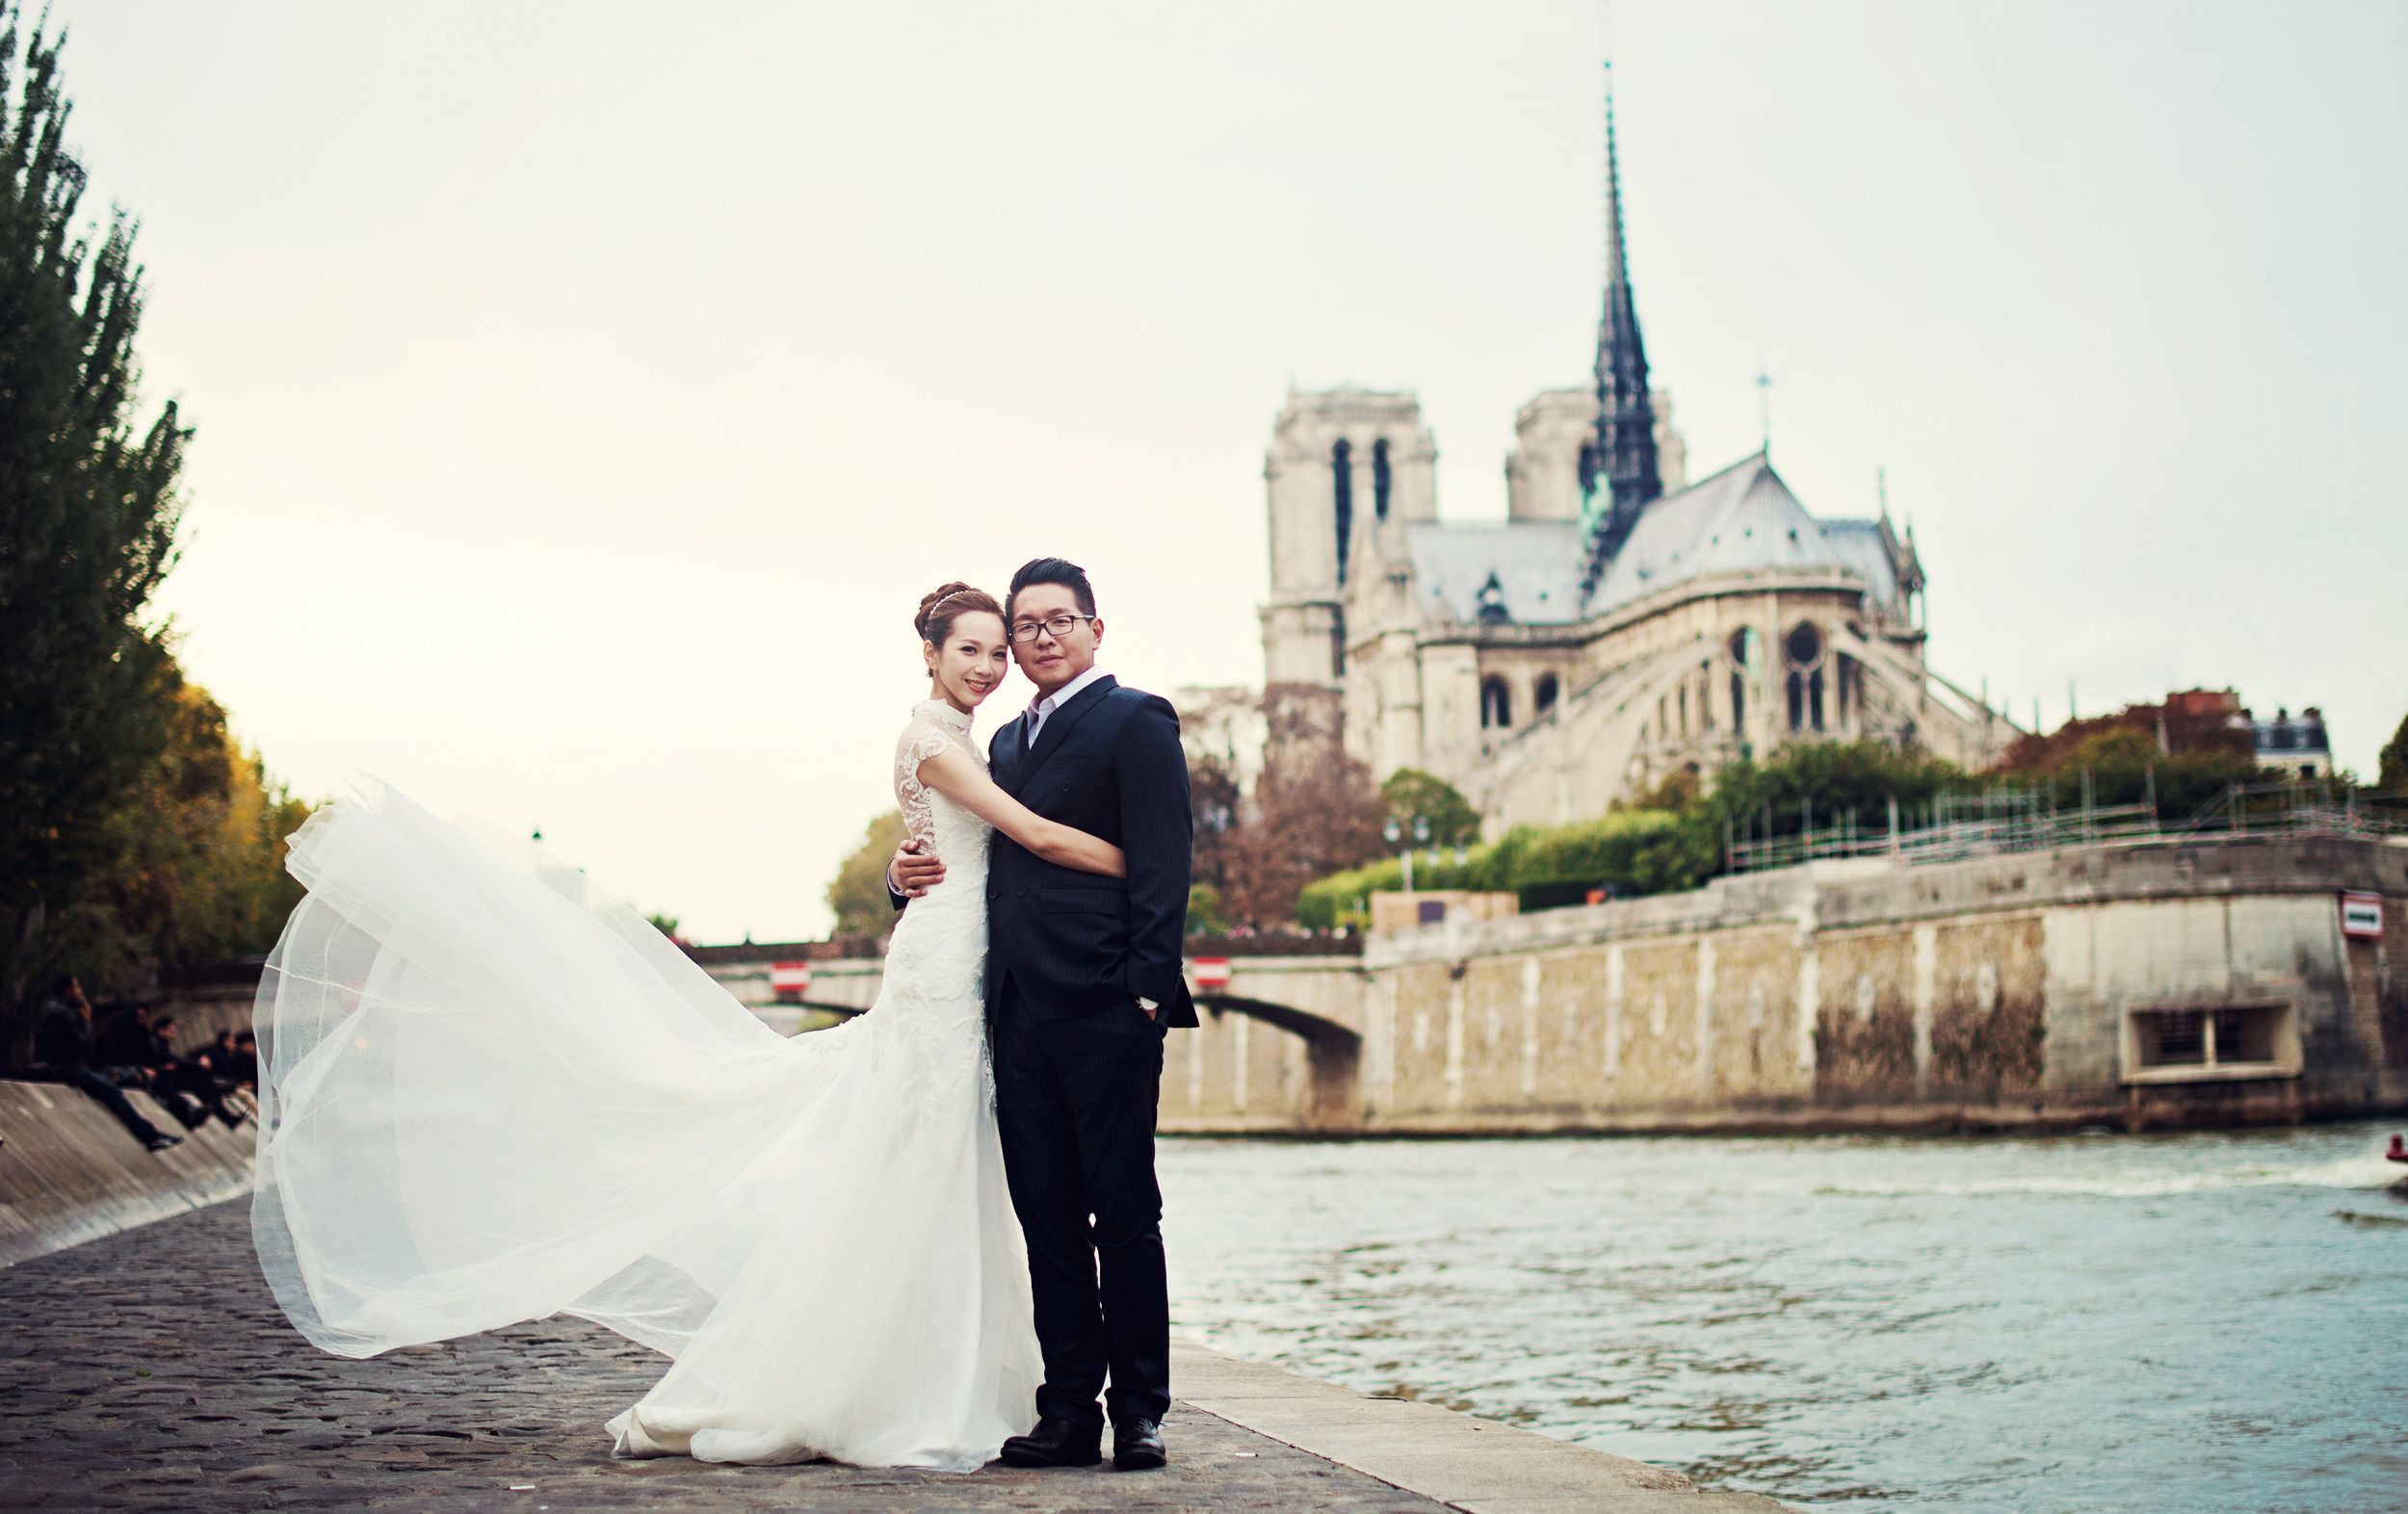 Chris_Hui_Paris_Prewedding_Photography207.jpg